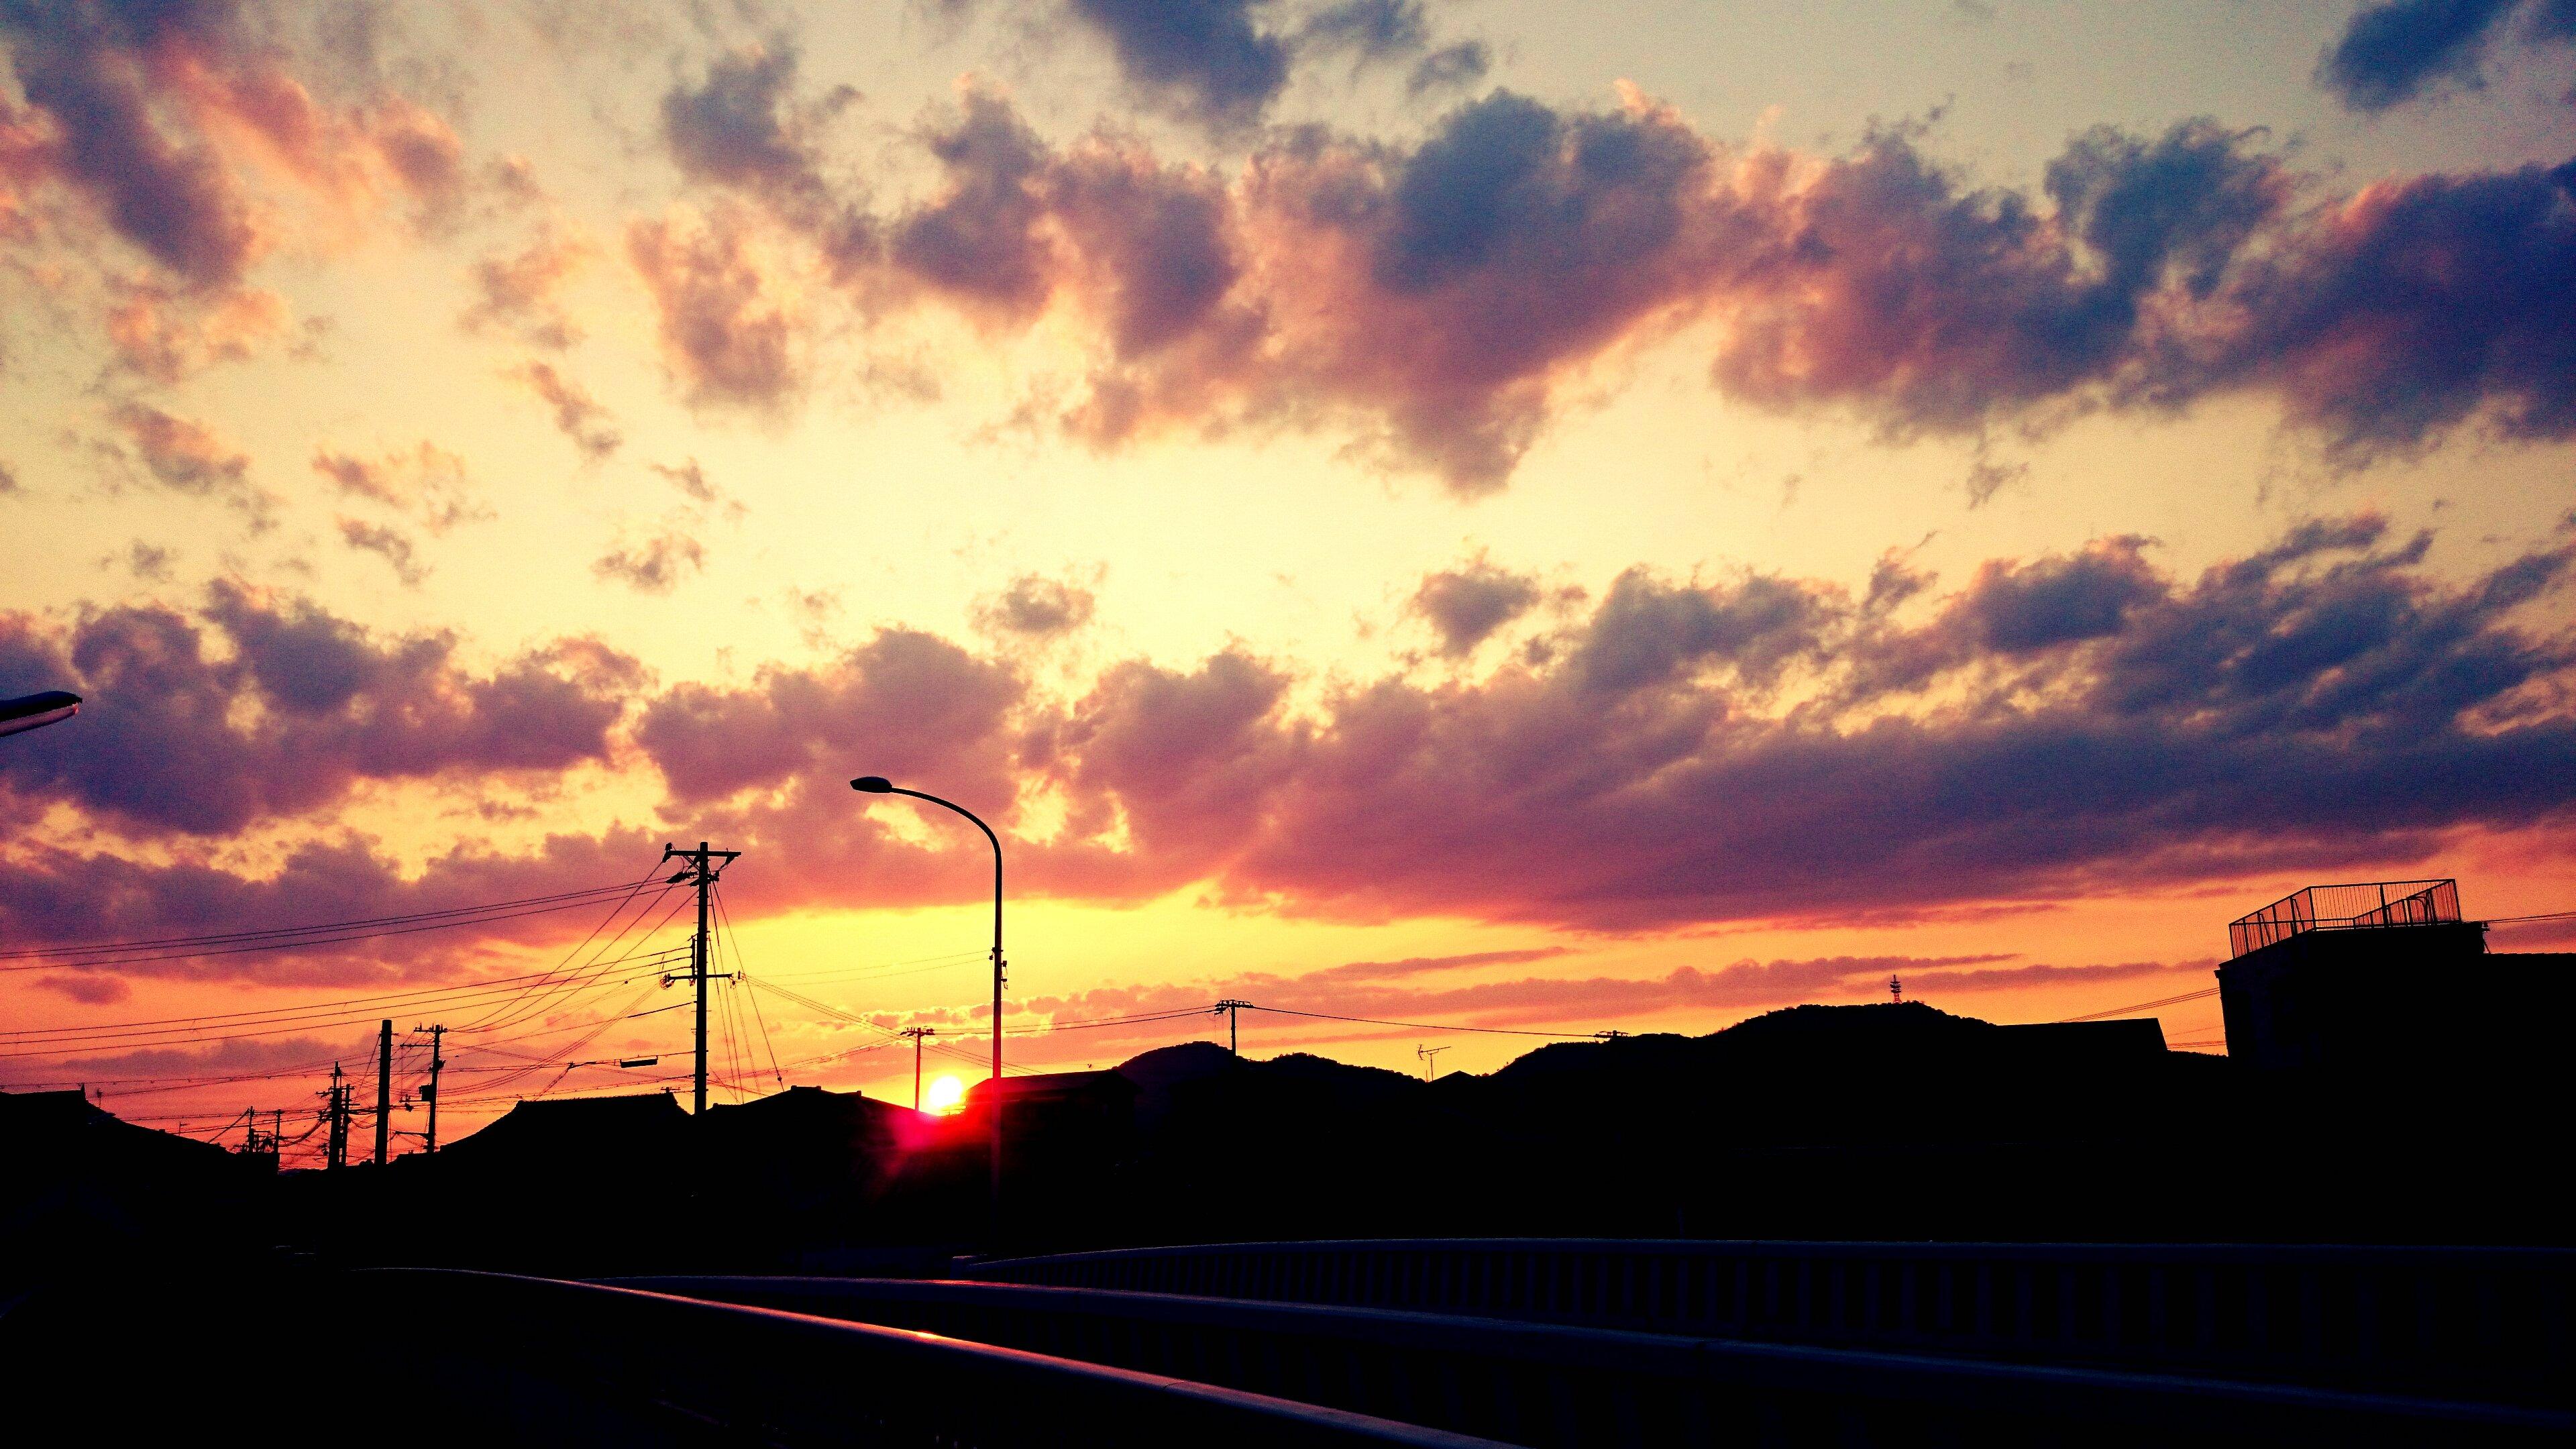 Sky anime sun sunset clouds amazing beautiful wallpaper - Anime sky background ...